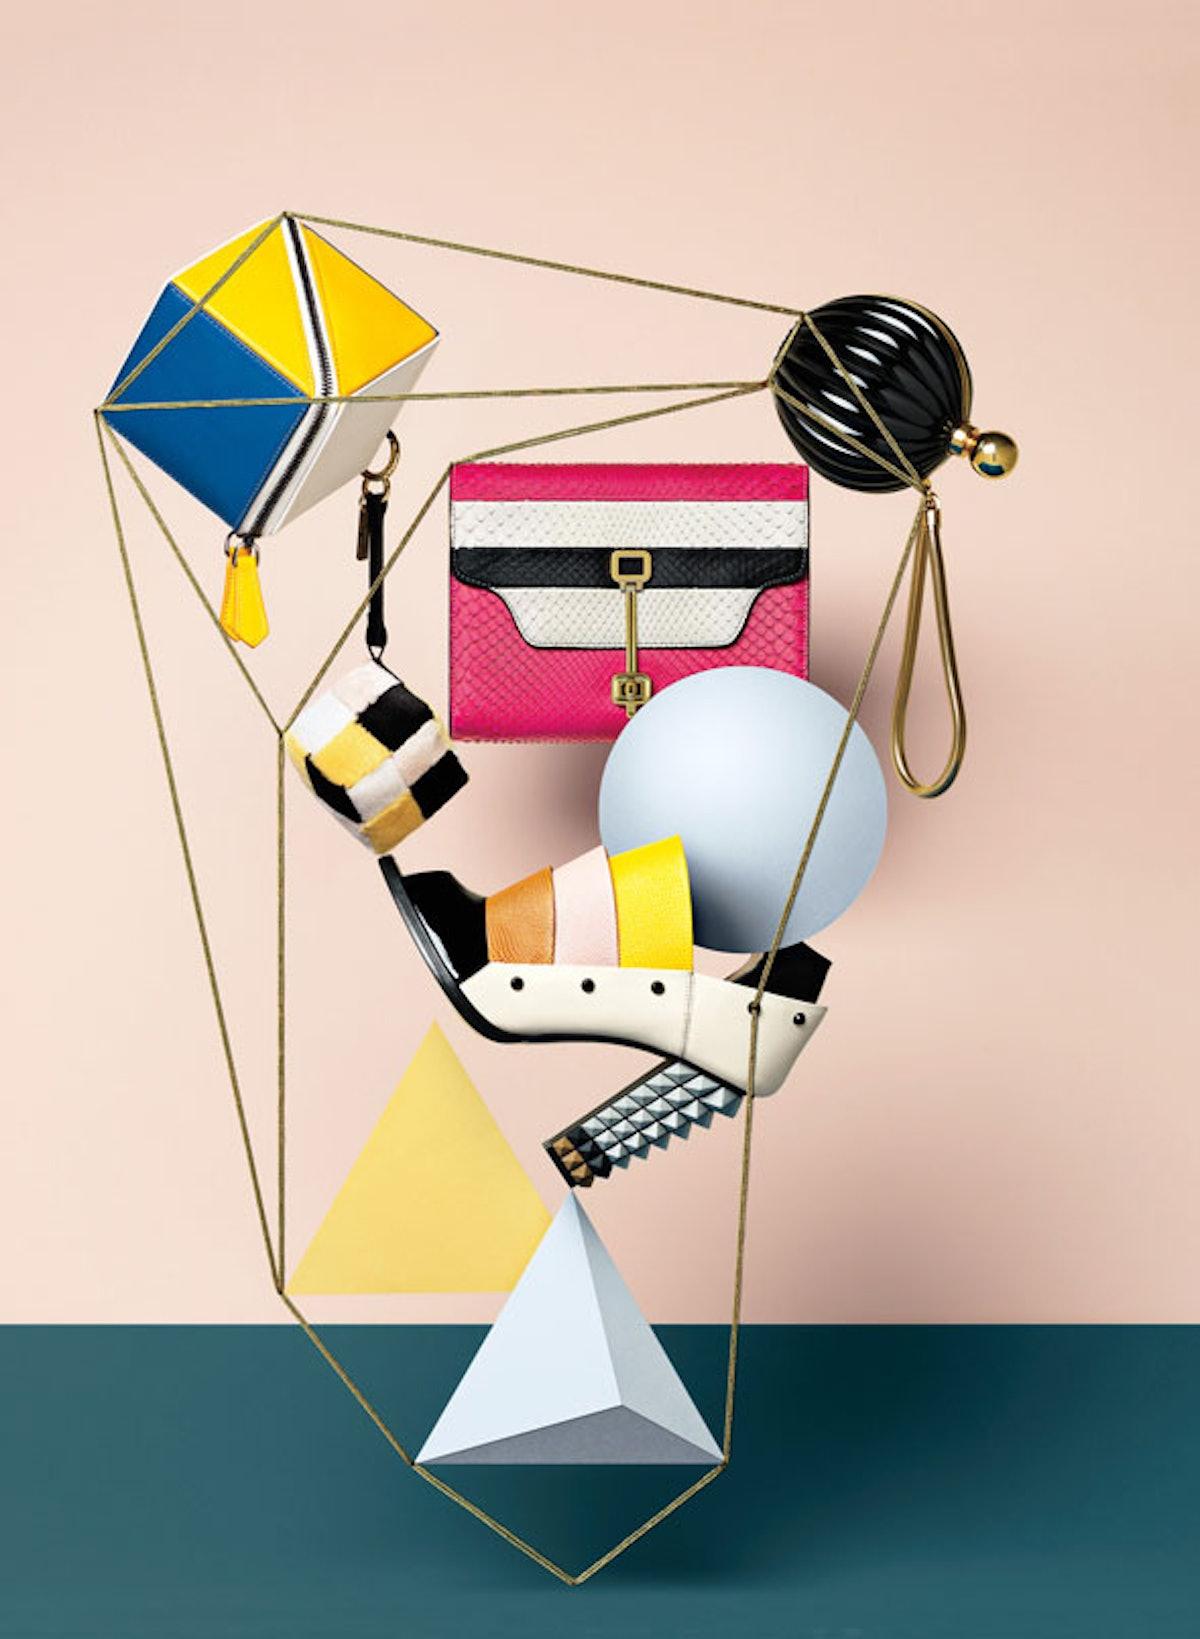 acar-colorful-bold-shapes-h.jpg